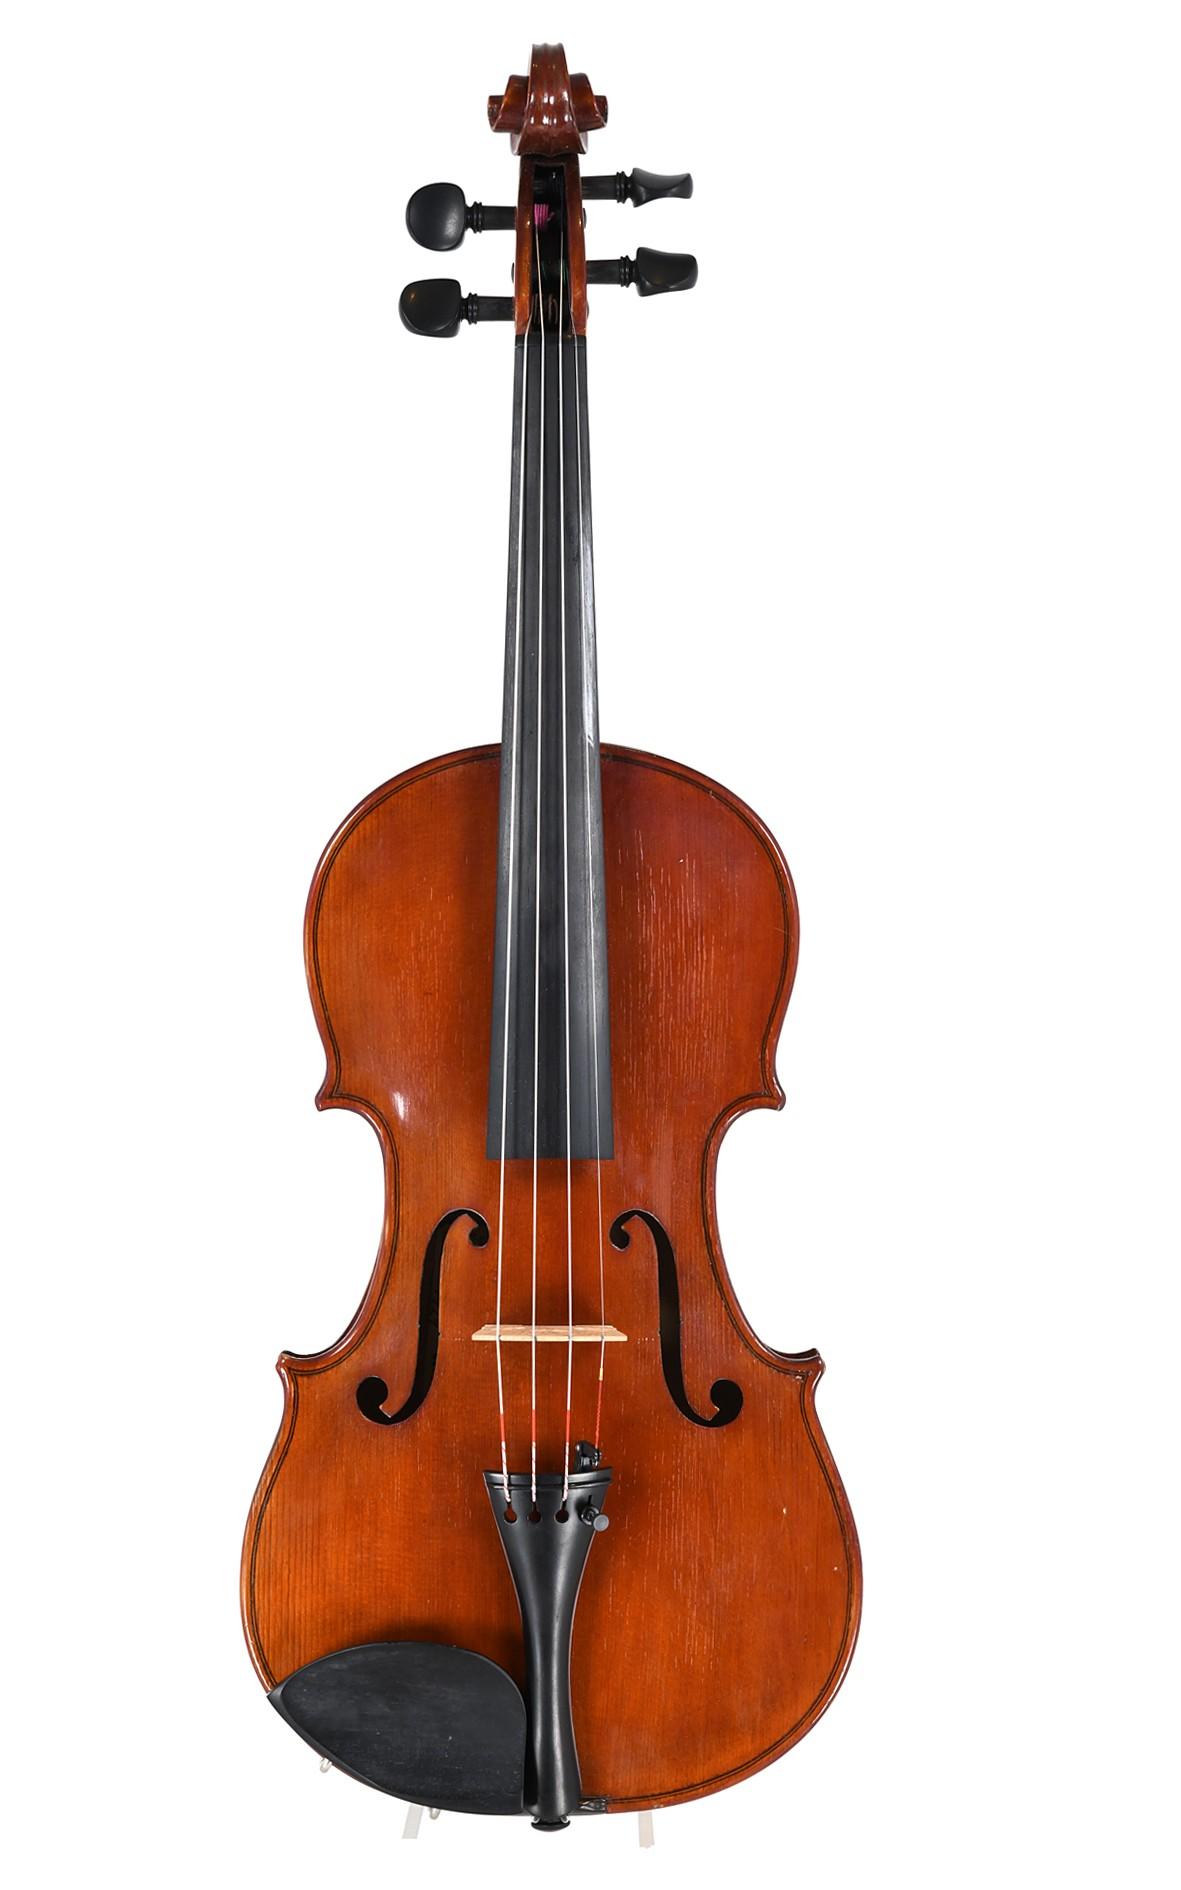 Italienische Geige, Raffaele Calace e figlio 1929